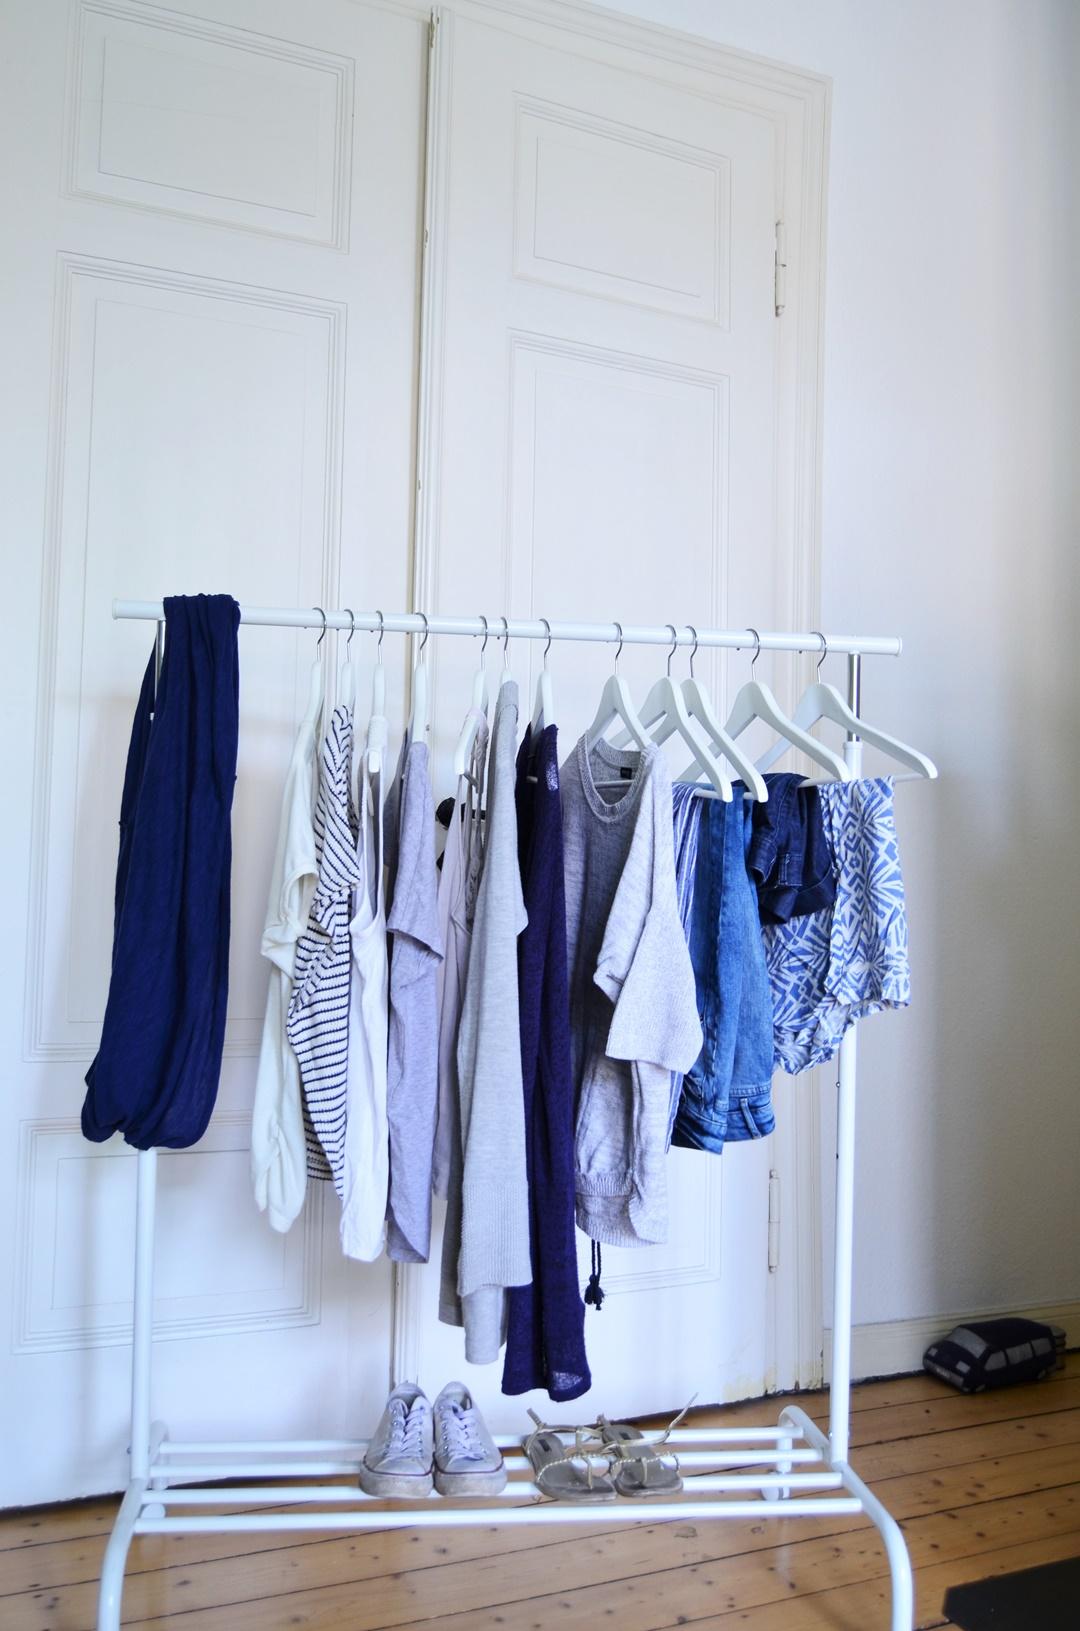 Juni 15x30_Minimalismus_Capsule Wardrobe_fair Fashion_Minimalistische Garderobe_Minimalismus Challenge_green Fashion_minimalism wardrobe_second hand_Annanikabu (4)